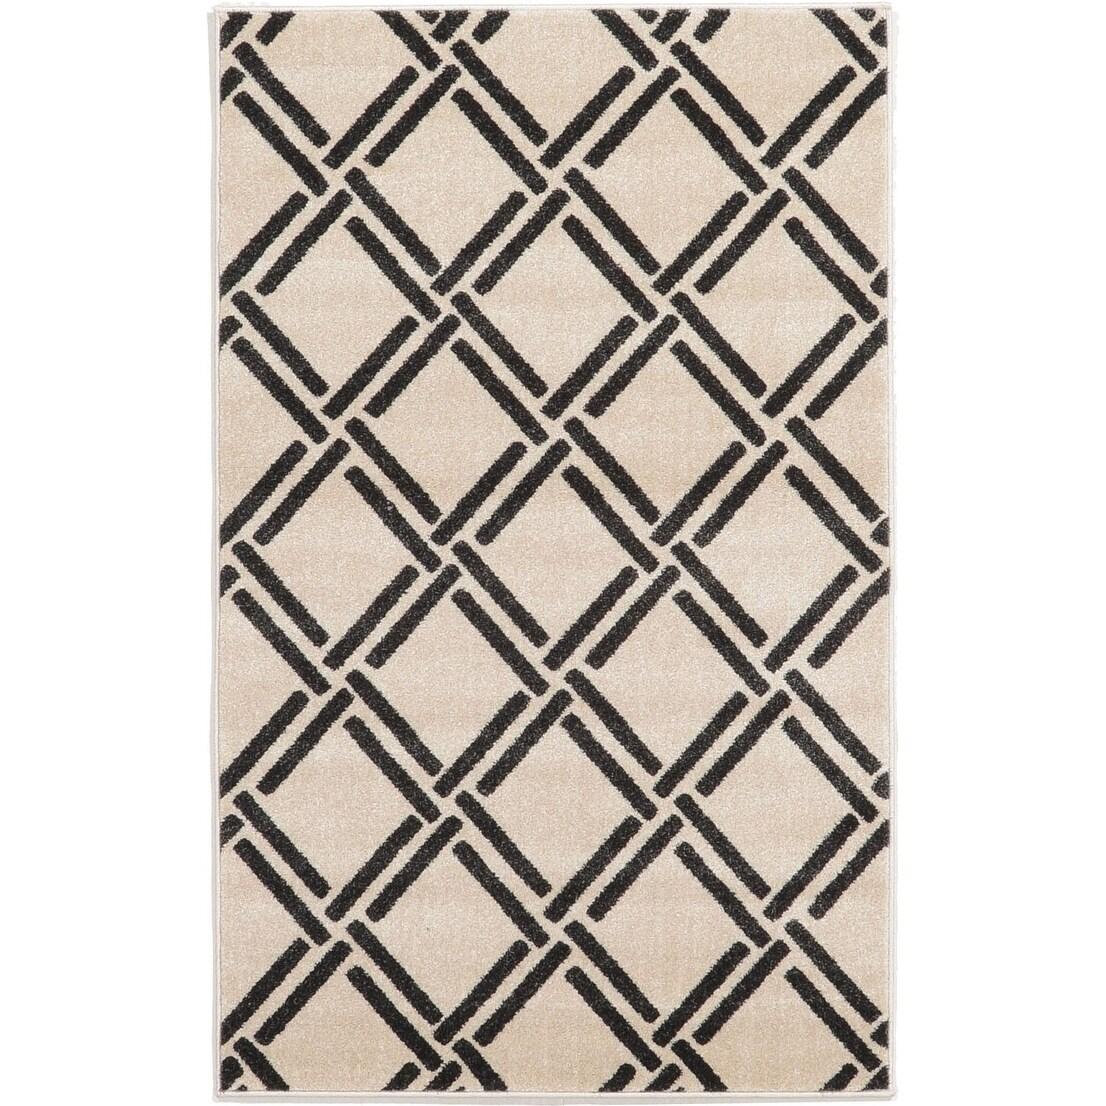 Geometric Rayon from Bamboo Trellis Beige/Black Polypropy...